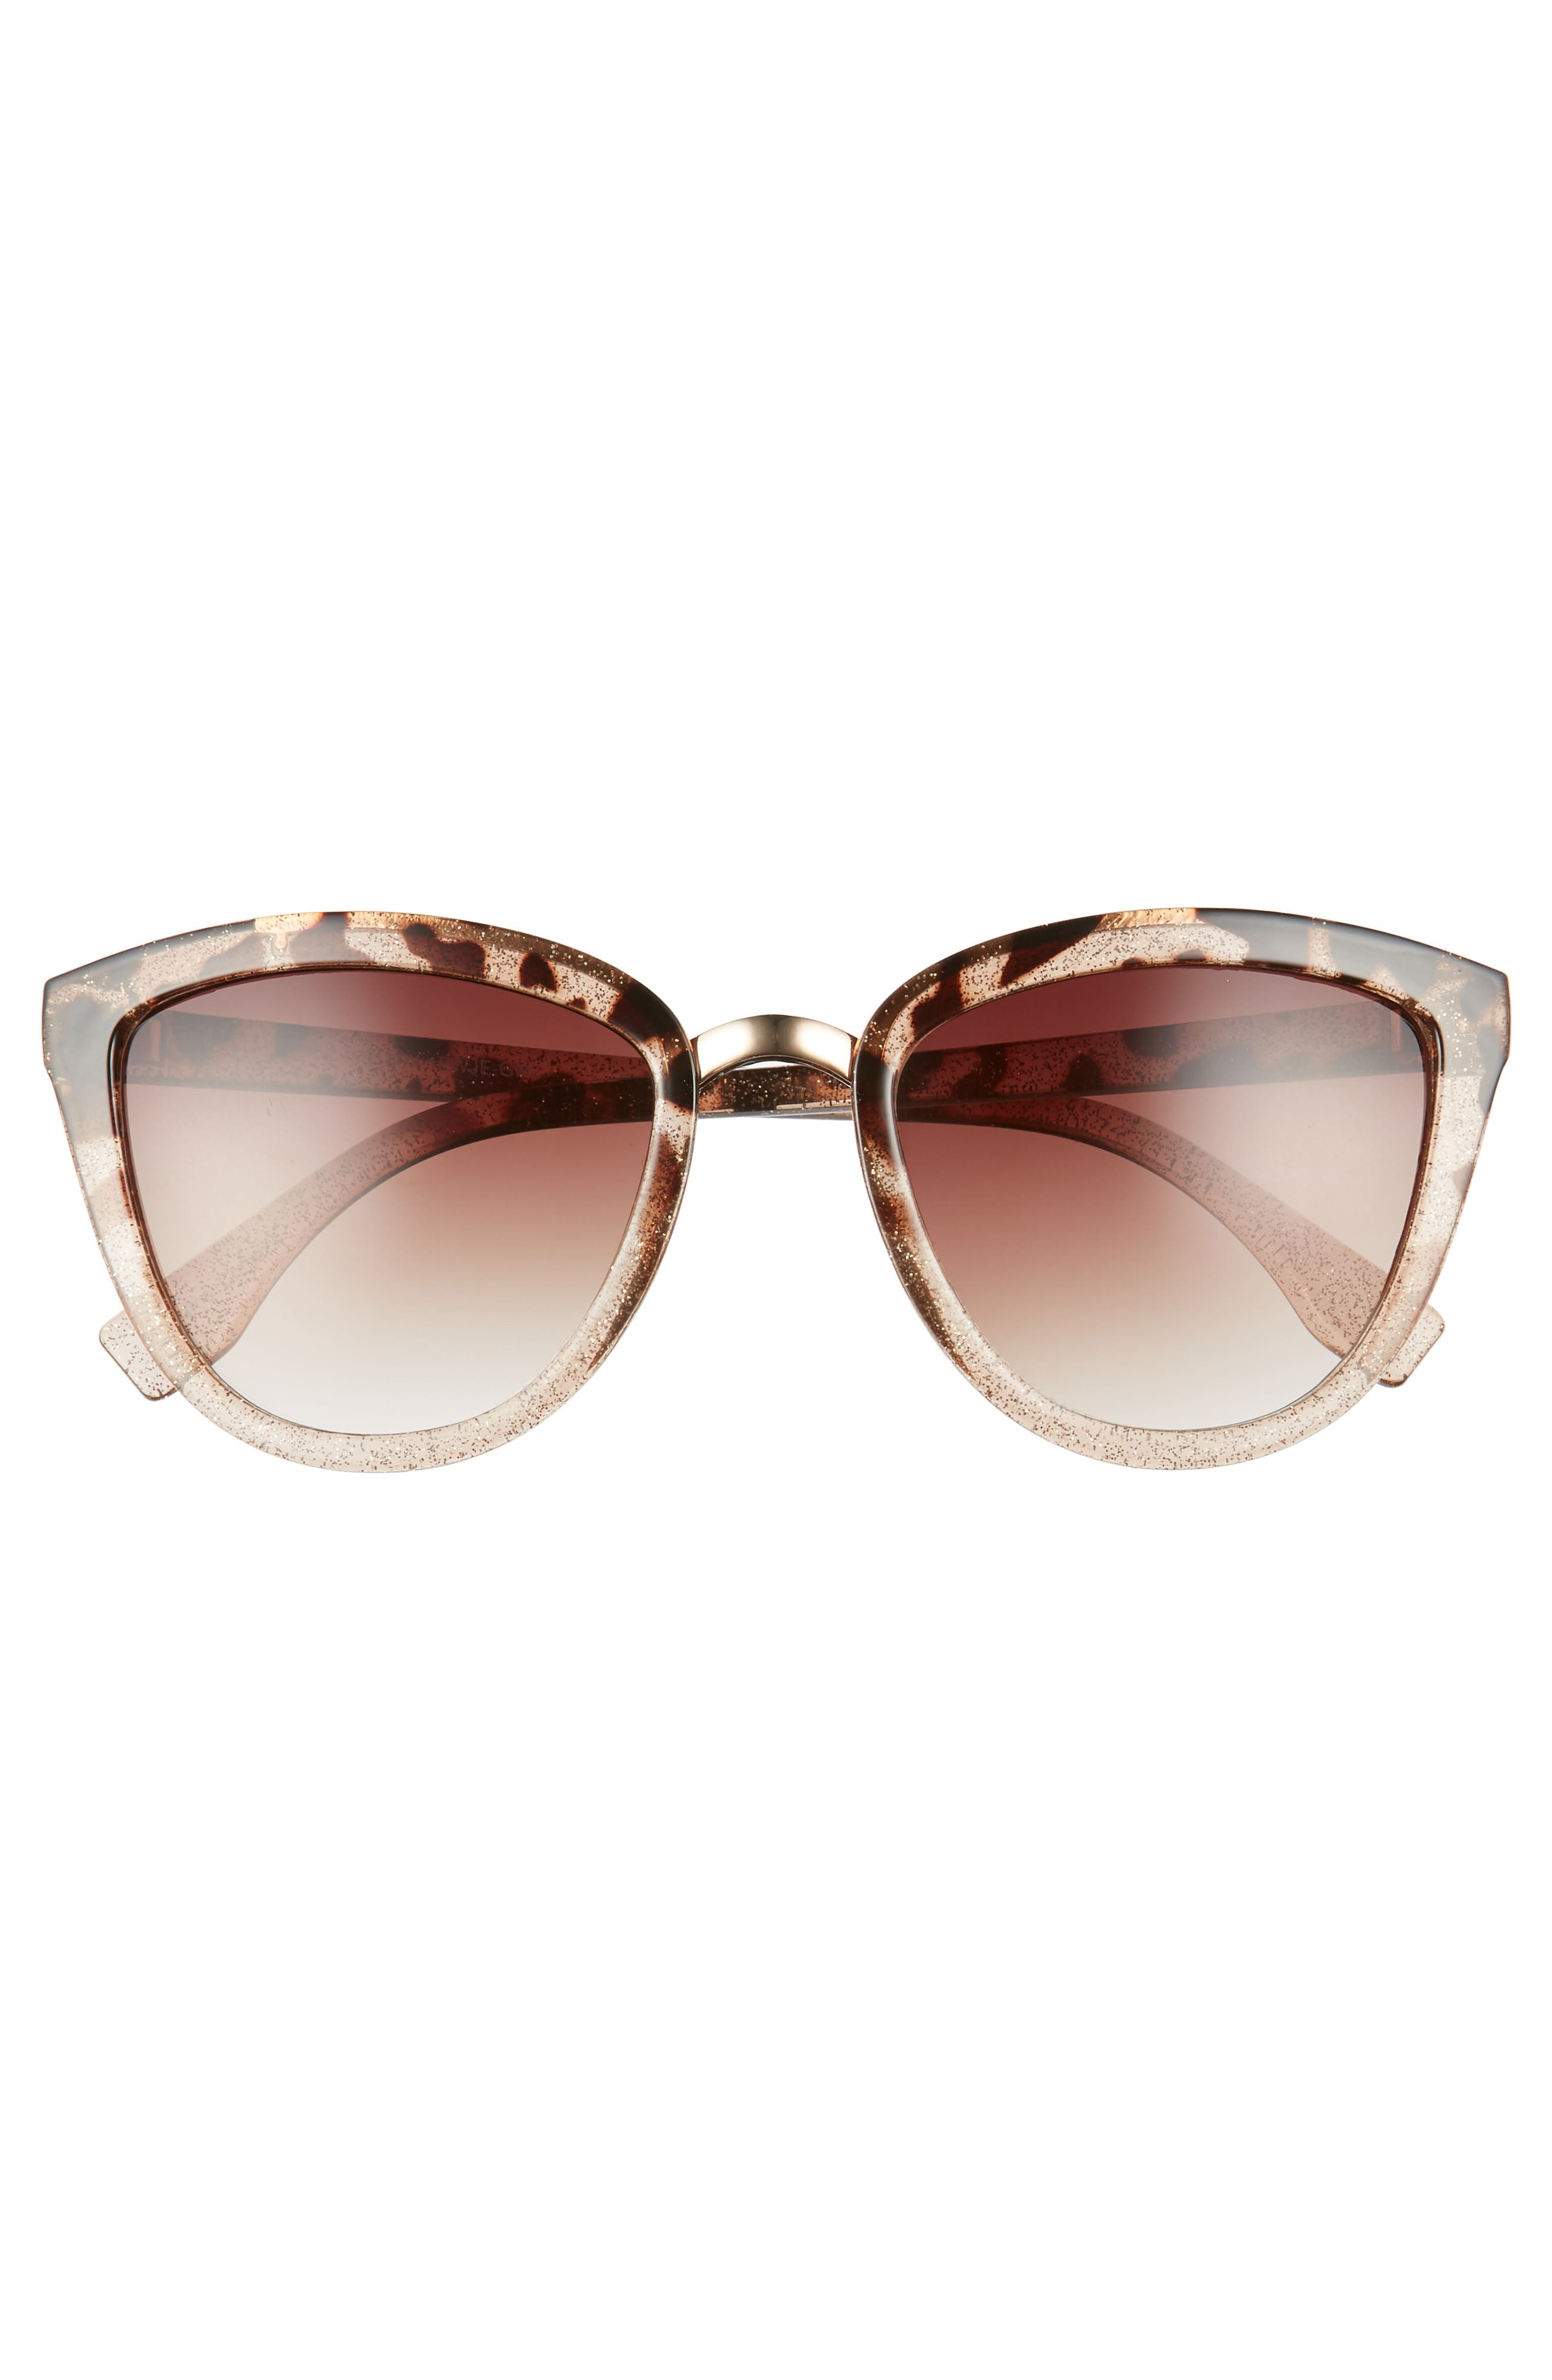 54mm Sparkle Cat Eye Sunglasses,                             Alternate thumbnail 3, color,                             200